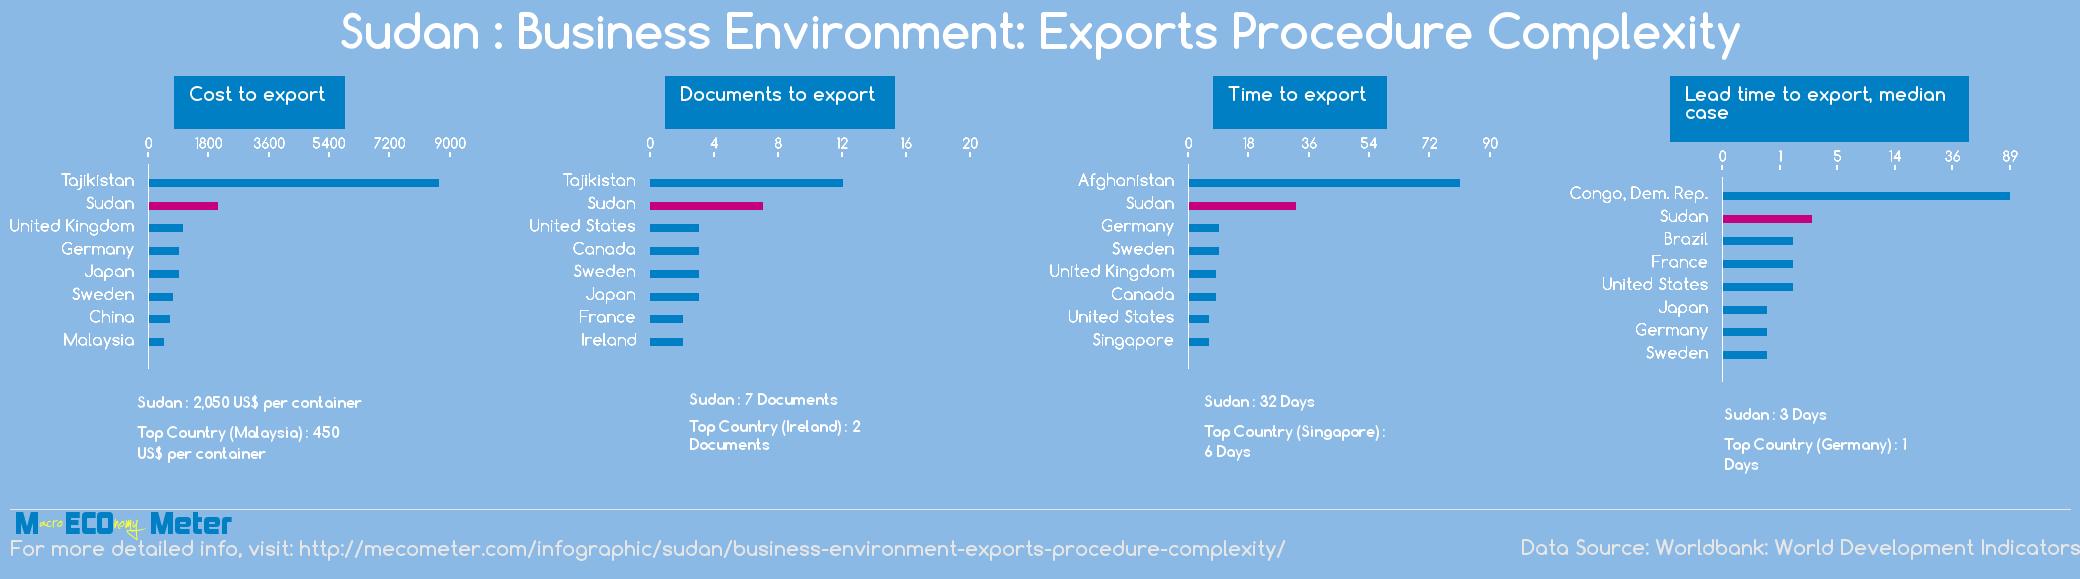 Sudan : Business Environment: Exports Procedure Complexity